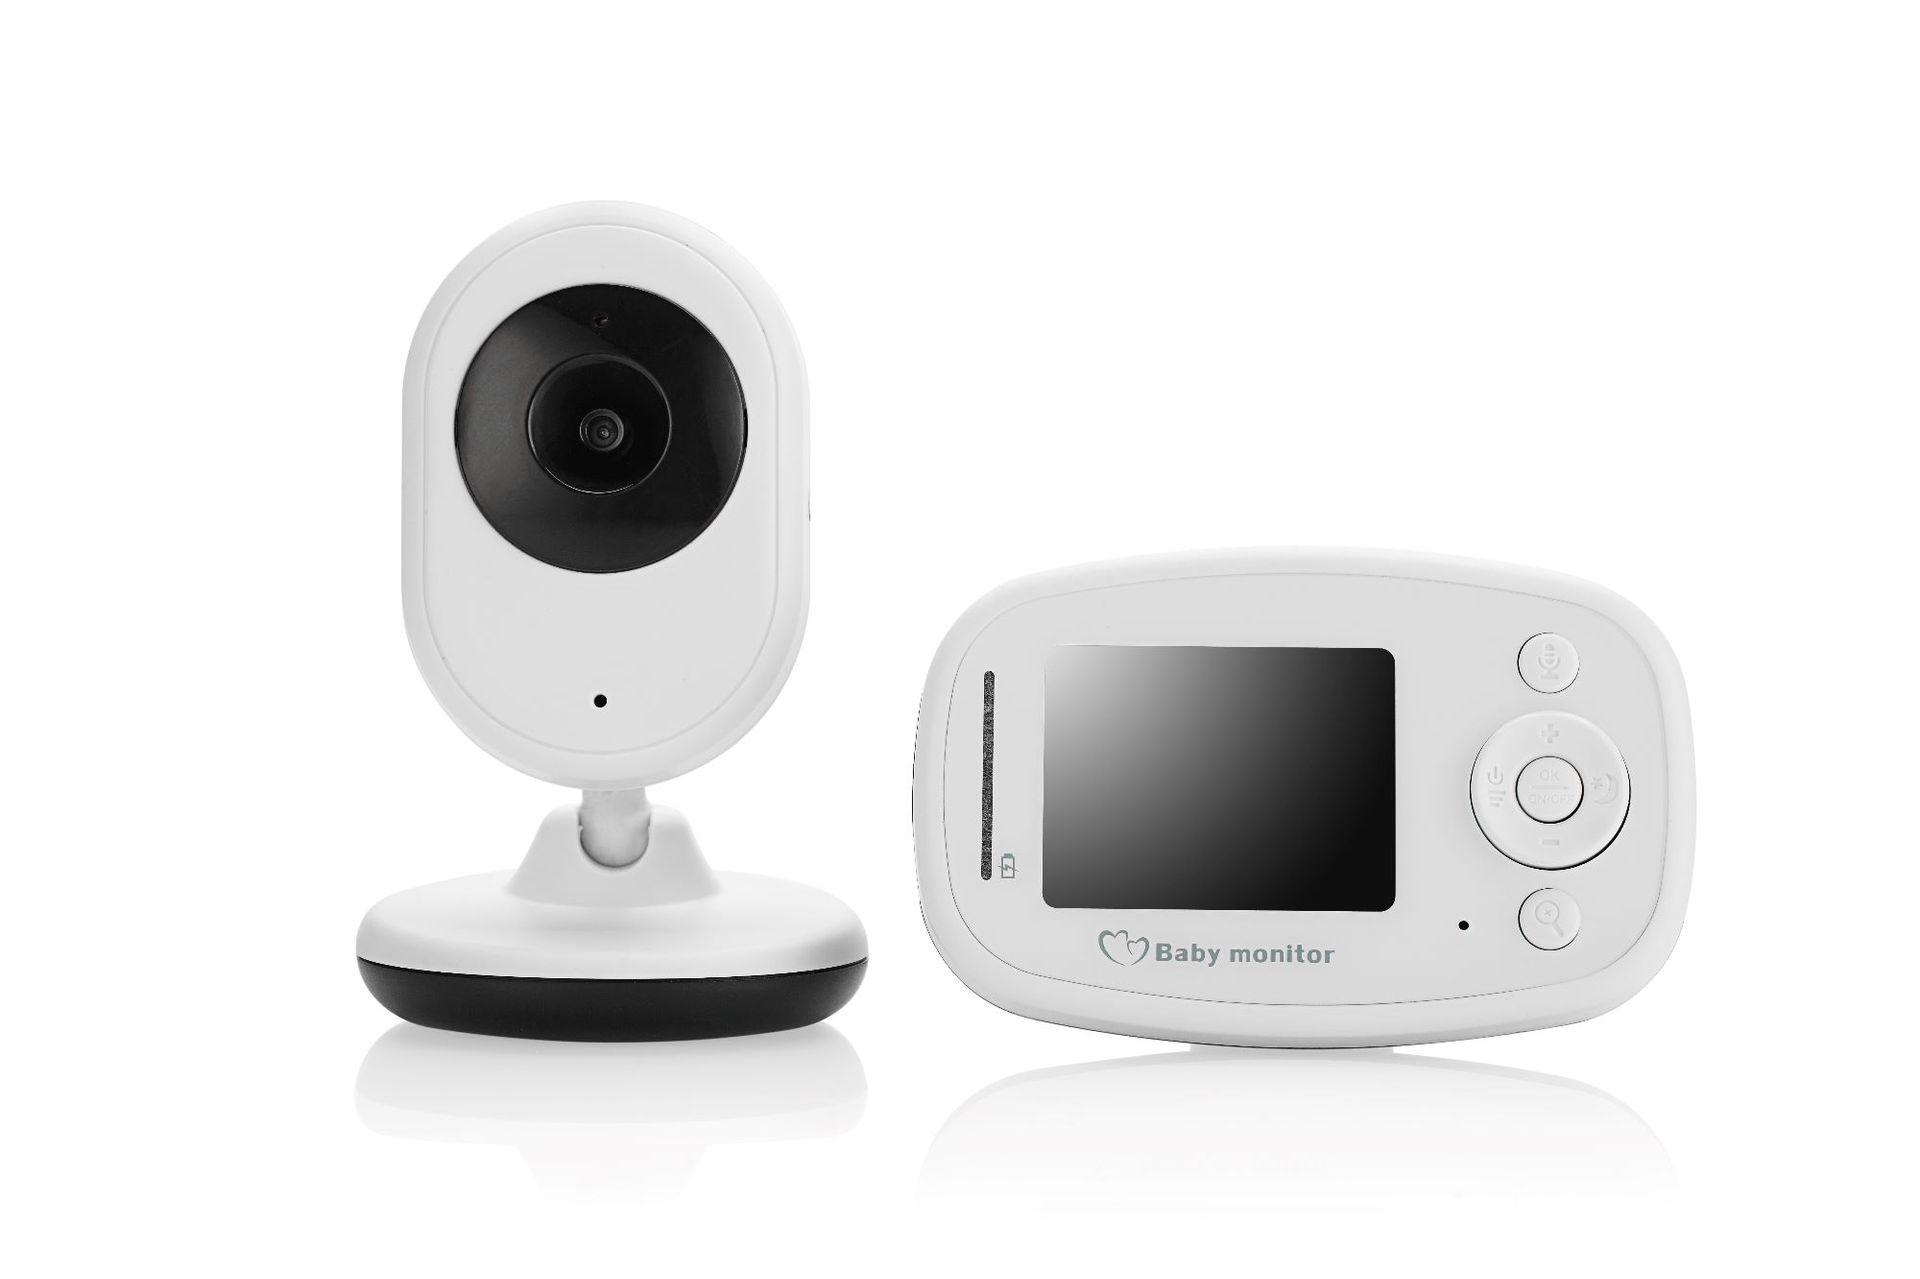 SP820 Wireless Baby Surveillance Camera Digital Caregiver Supports Intercom Room Temperature Display Lullaby Singing US Plug